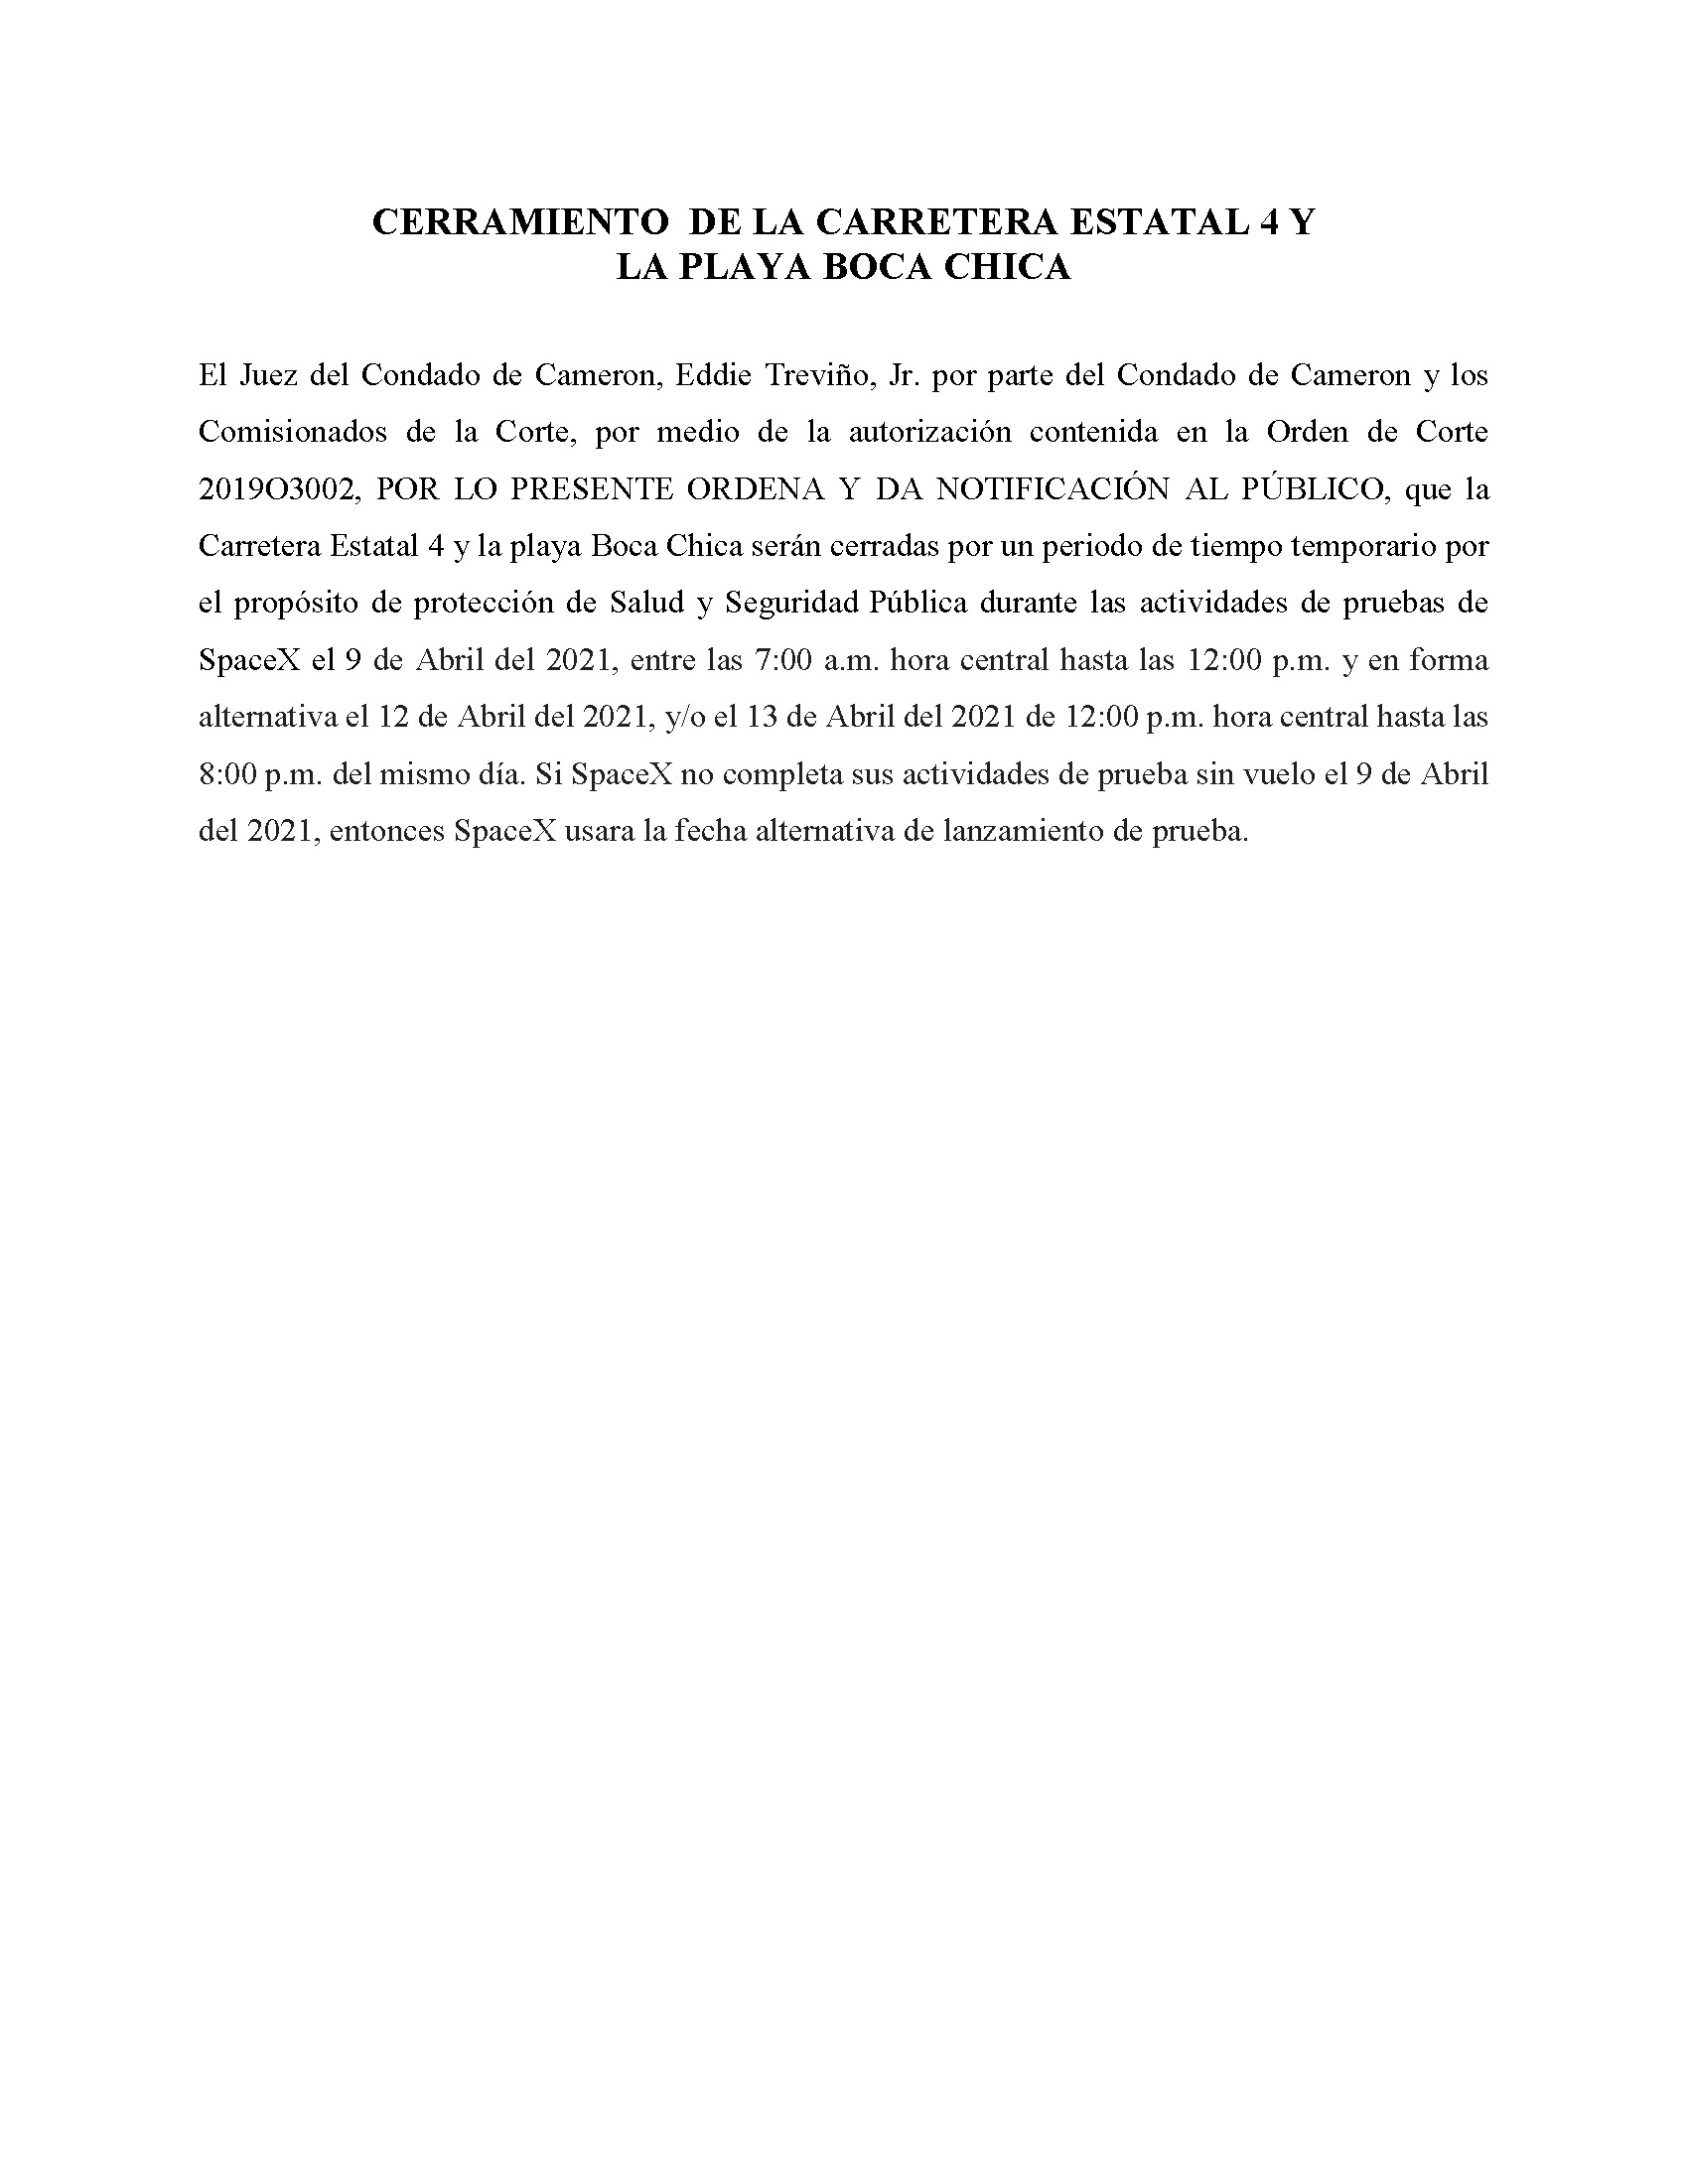 ORDER.CLOSURE OF HIGHWAY 4 Y LA PLAYA BOCA CHICA.SPANISH.04.09.21